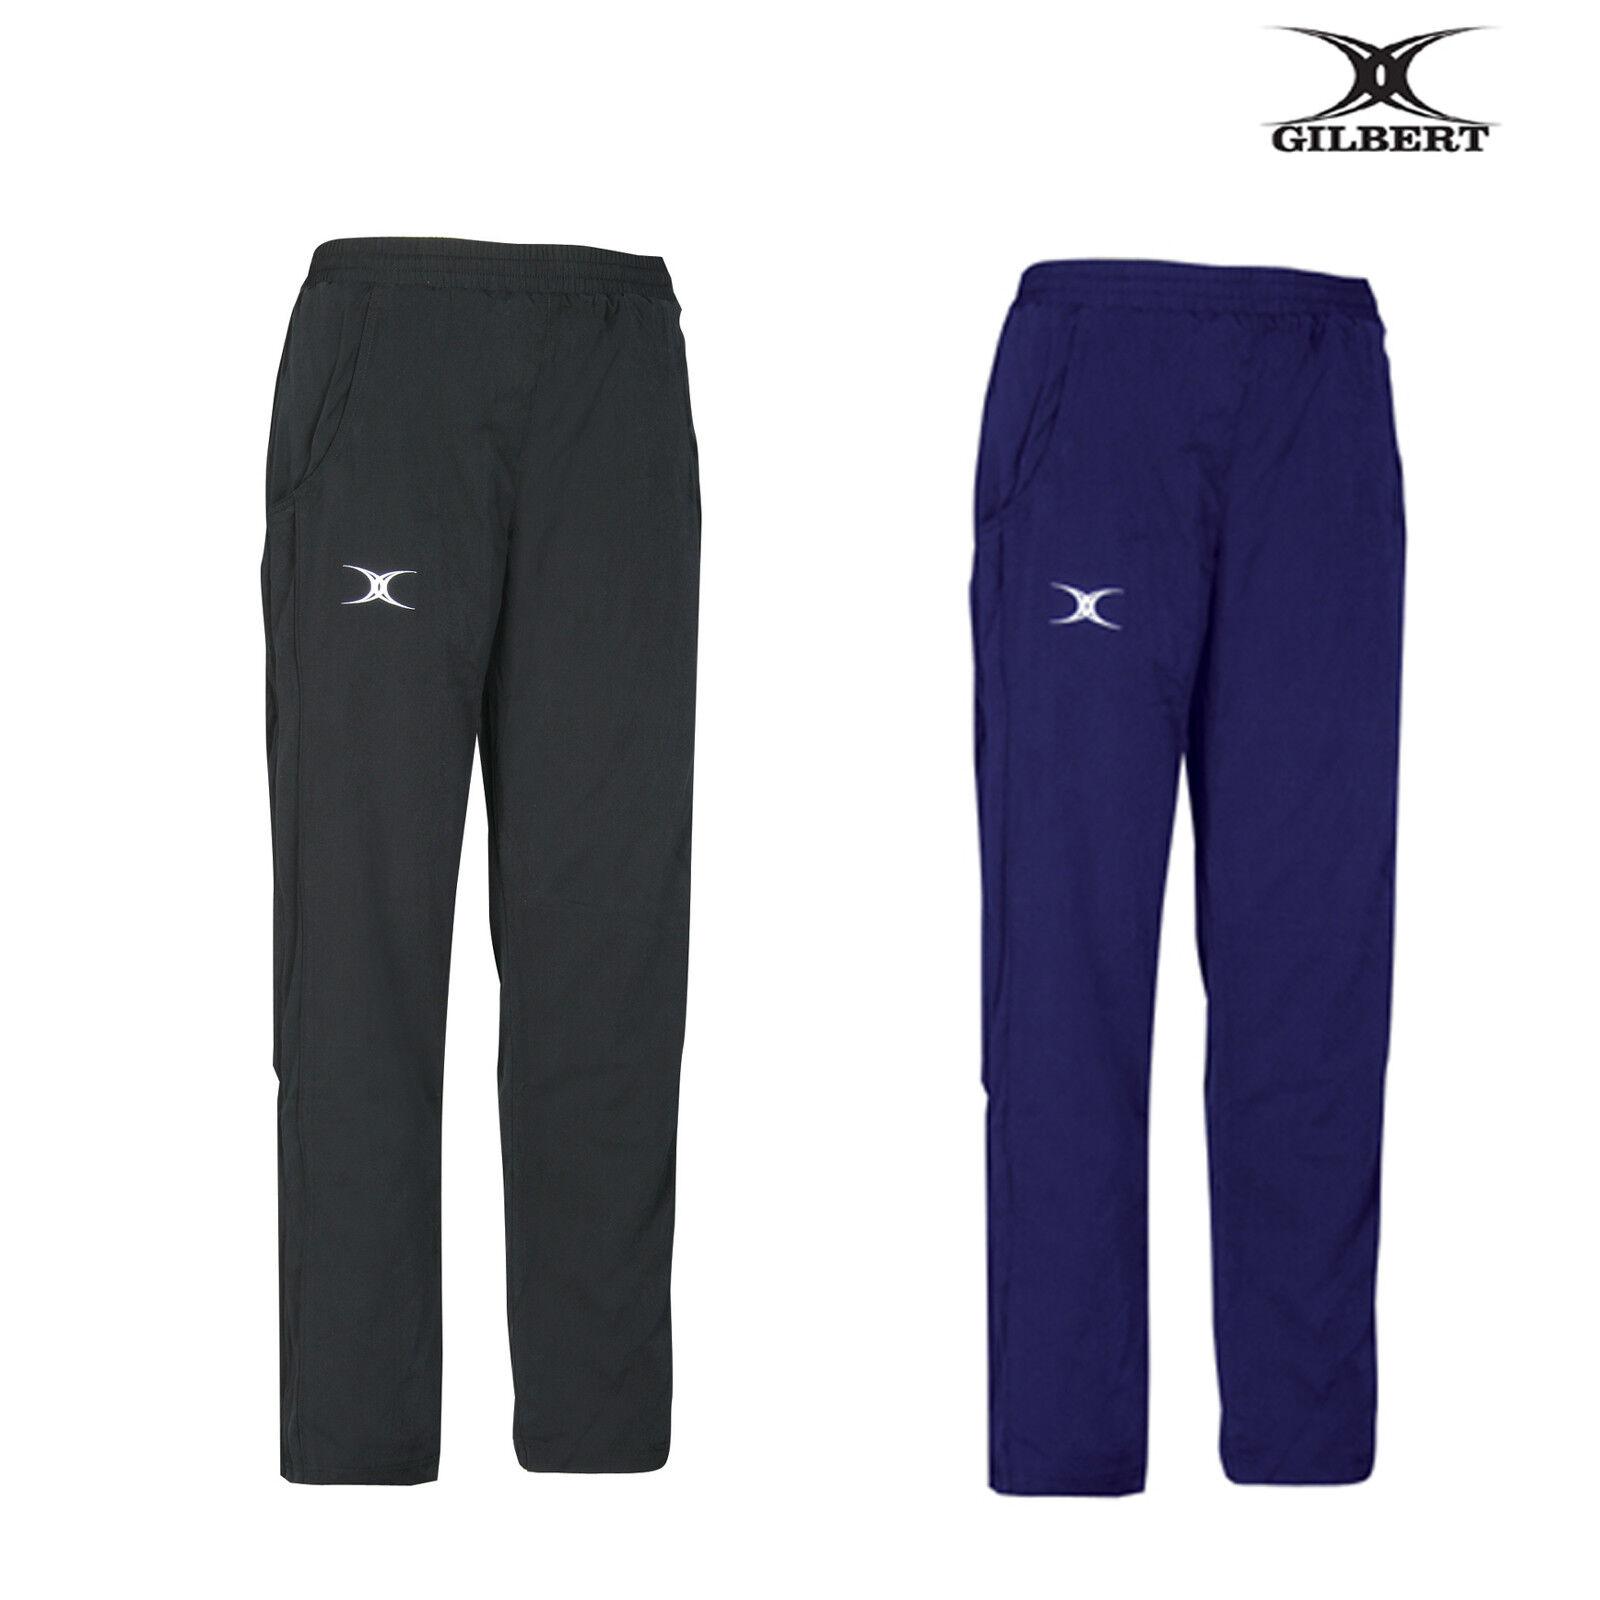 Gilbert Rugby  adultos Synergie Trousers GI005-Para Hombres Pantalones Deportivos activewear  tienda en linea